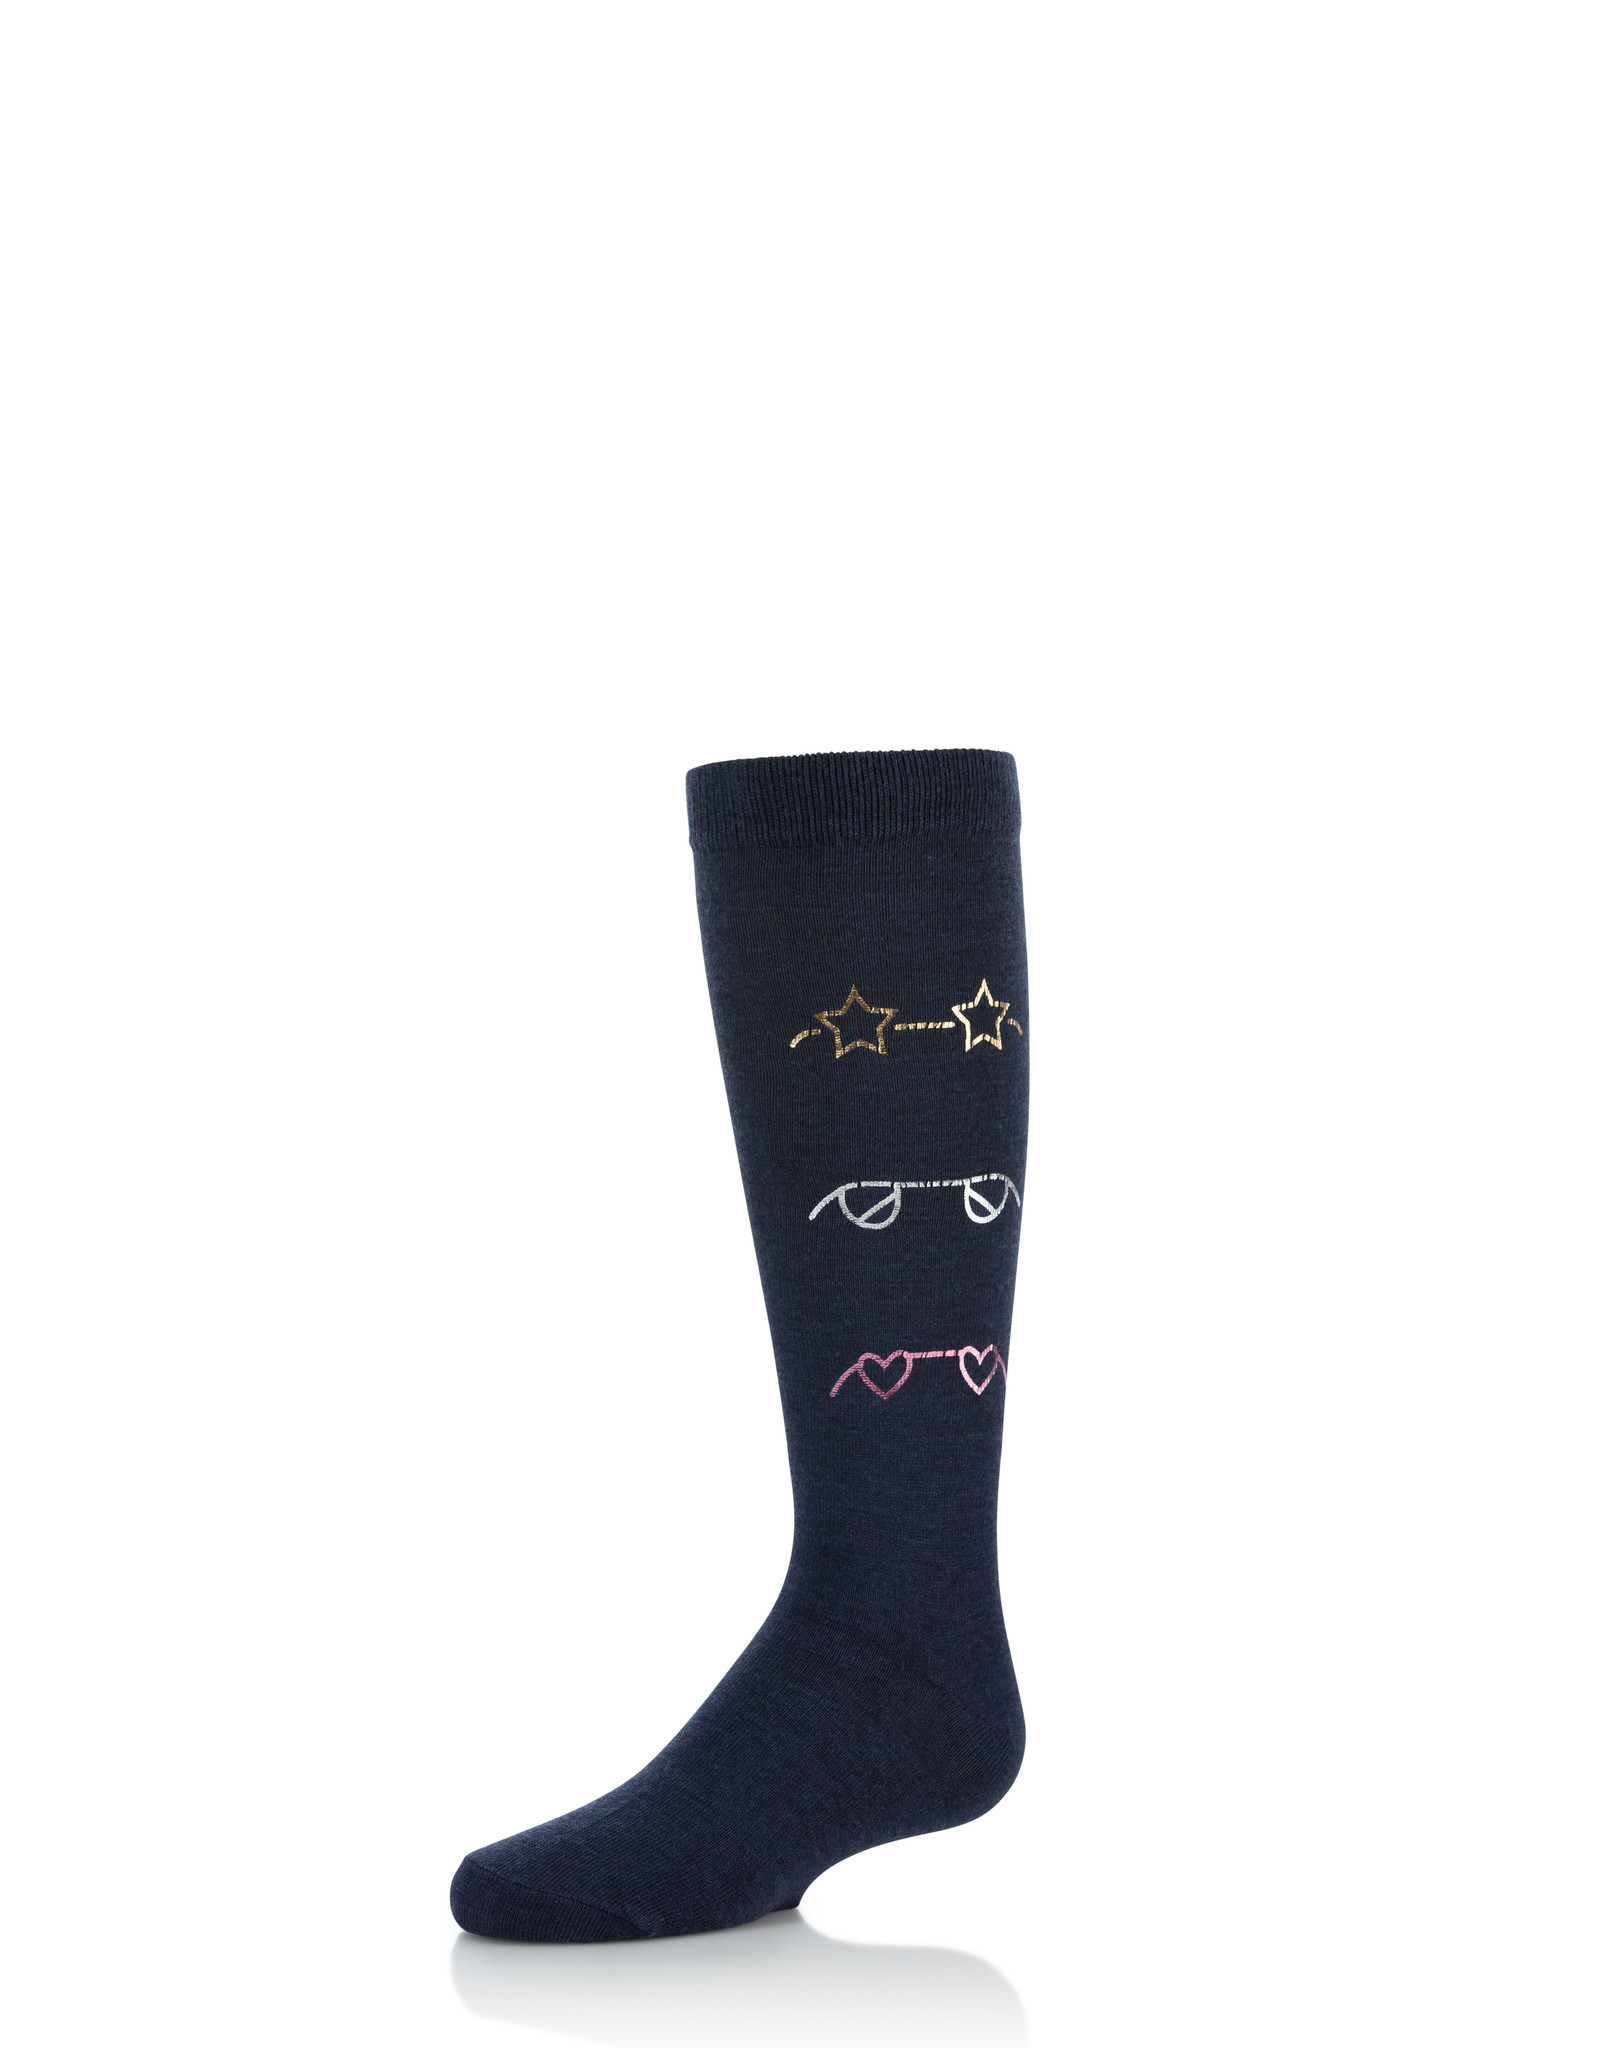 Zubii Zubii Stamped Glasses Knee Sock